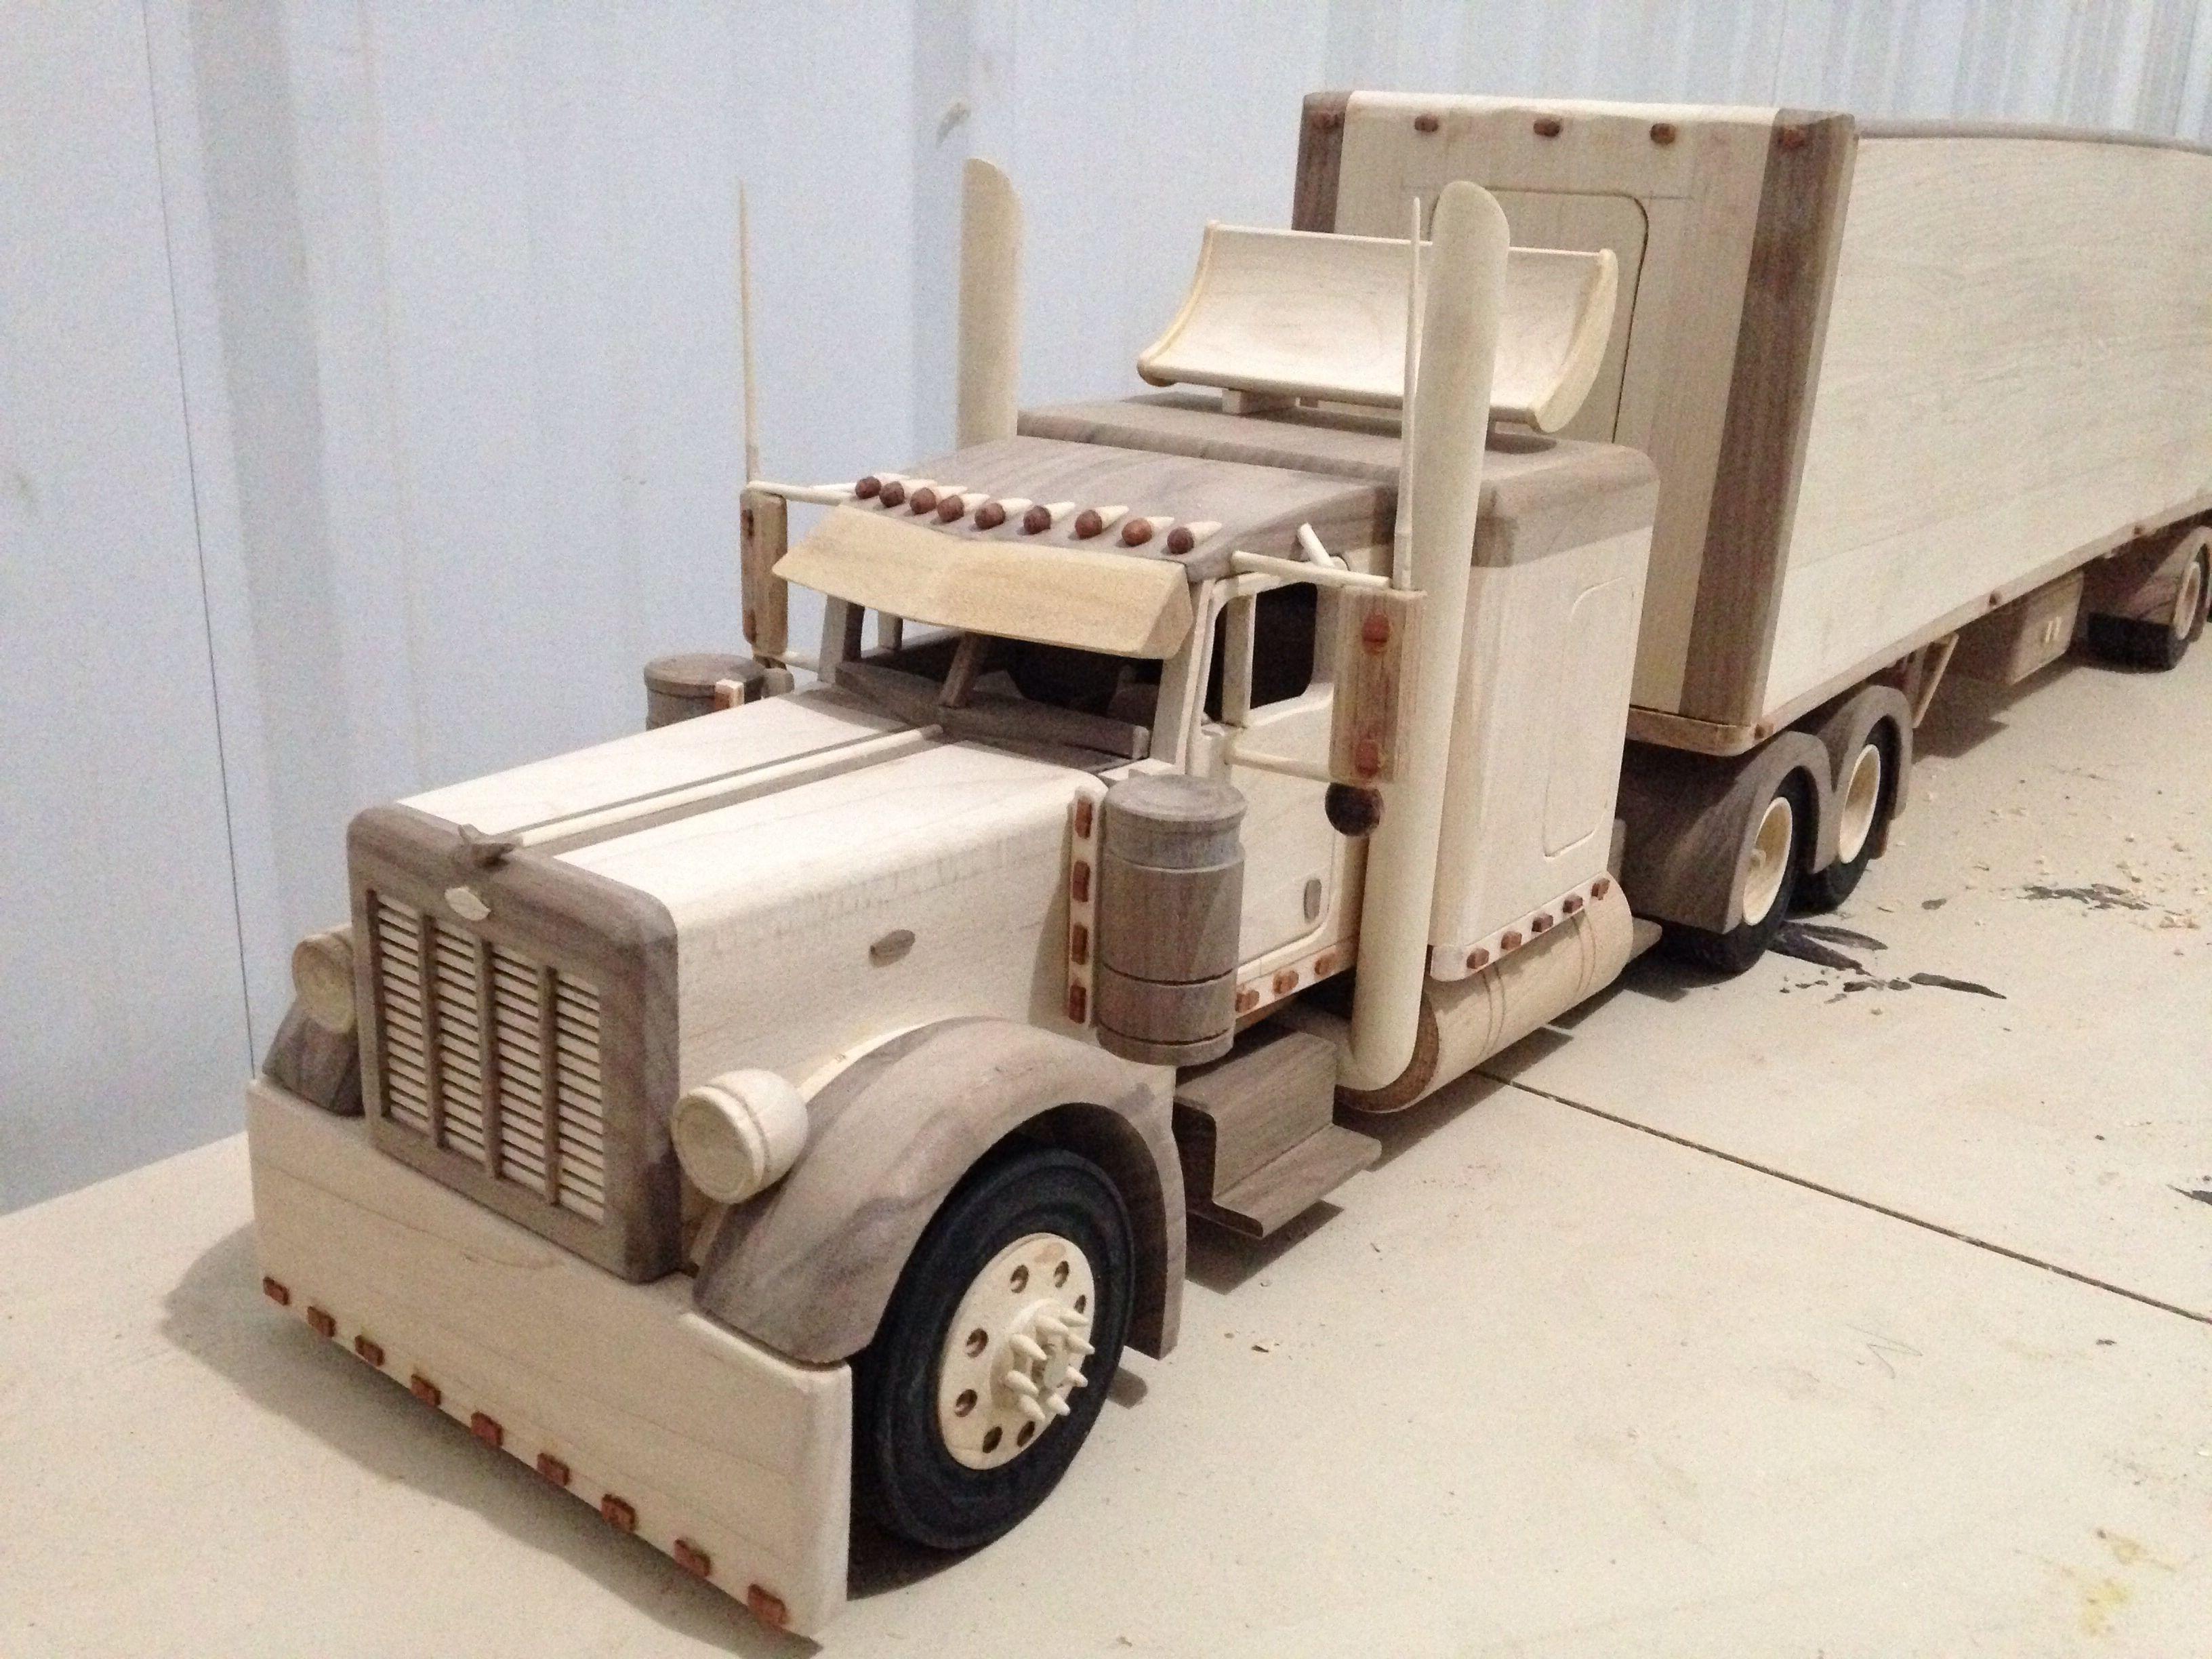 De Juguete Madera Peterbilt TruckMiscelaneous Camiones XiuOPZk